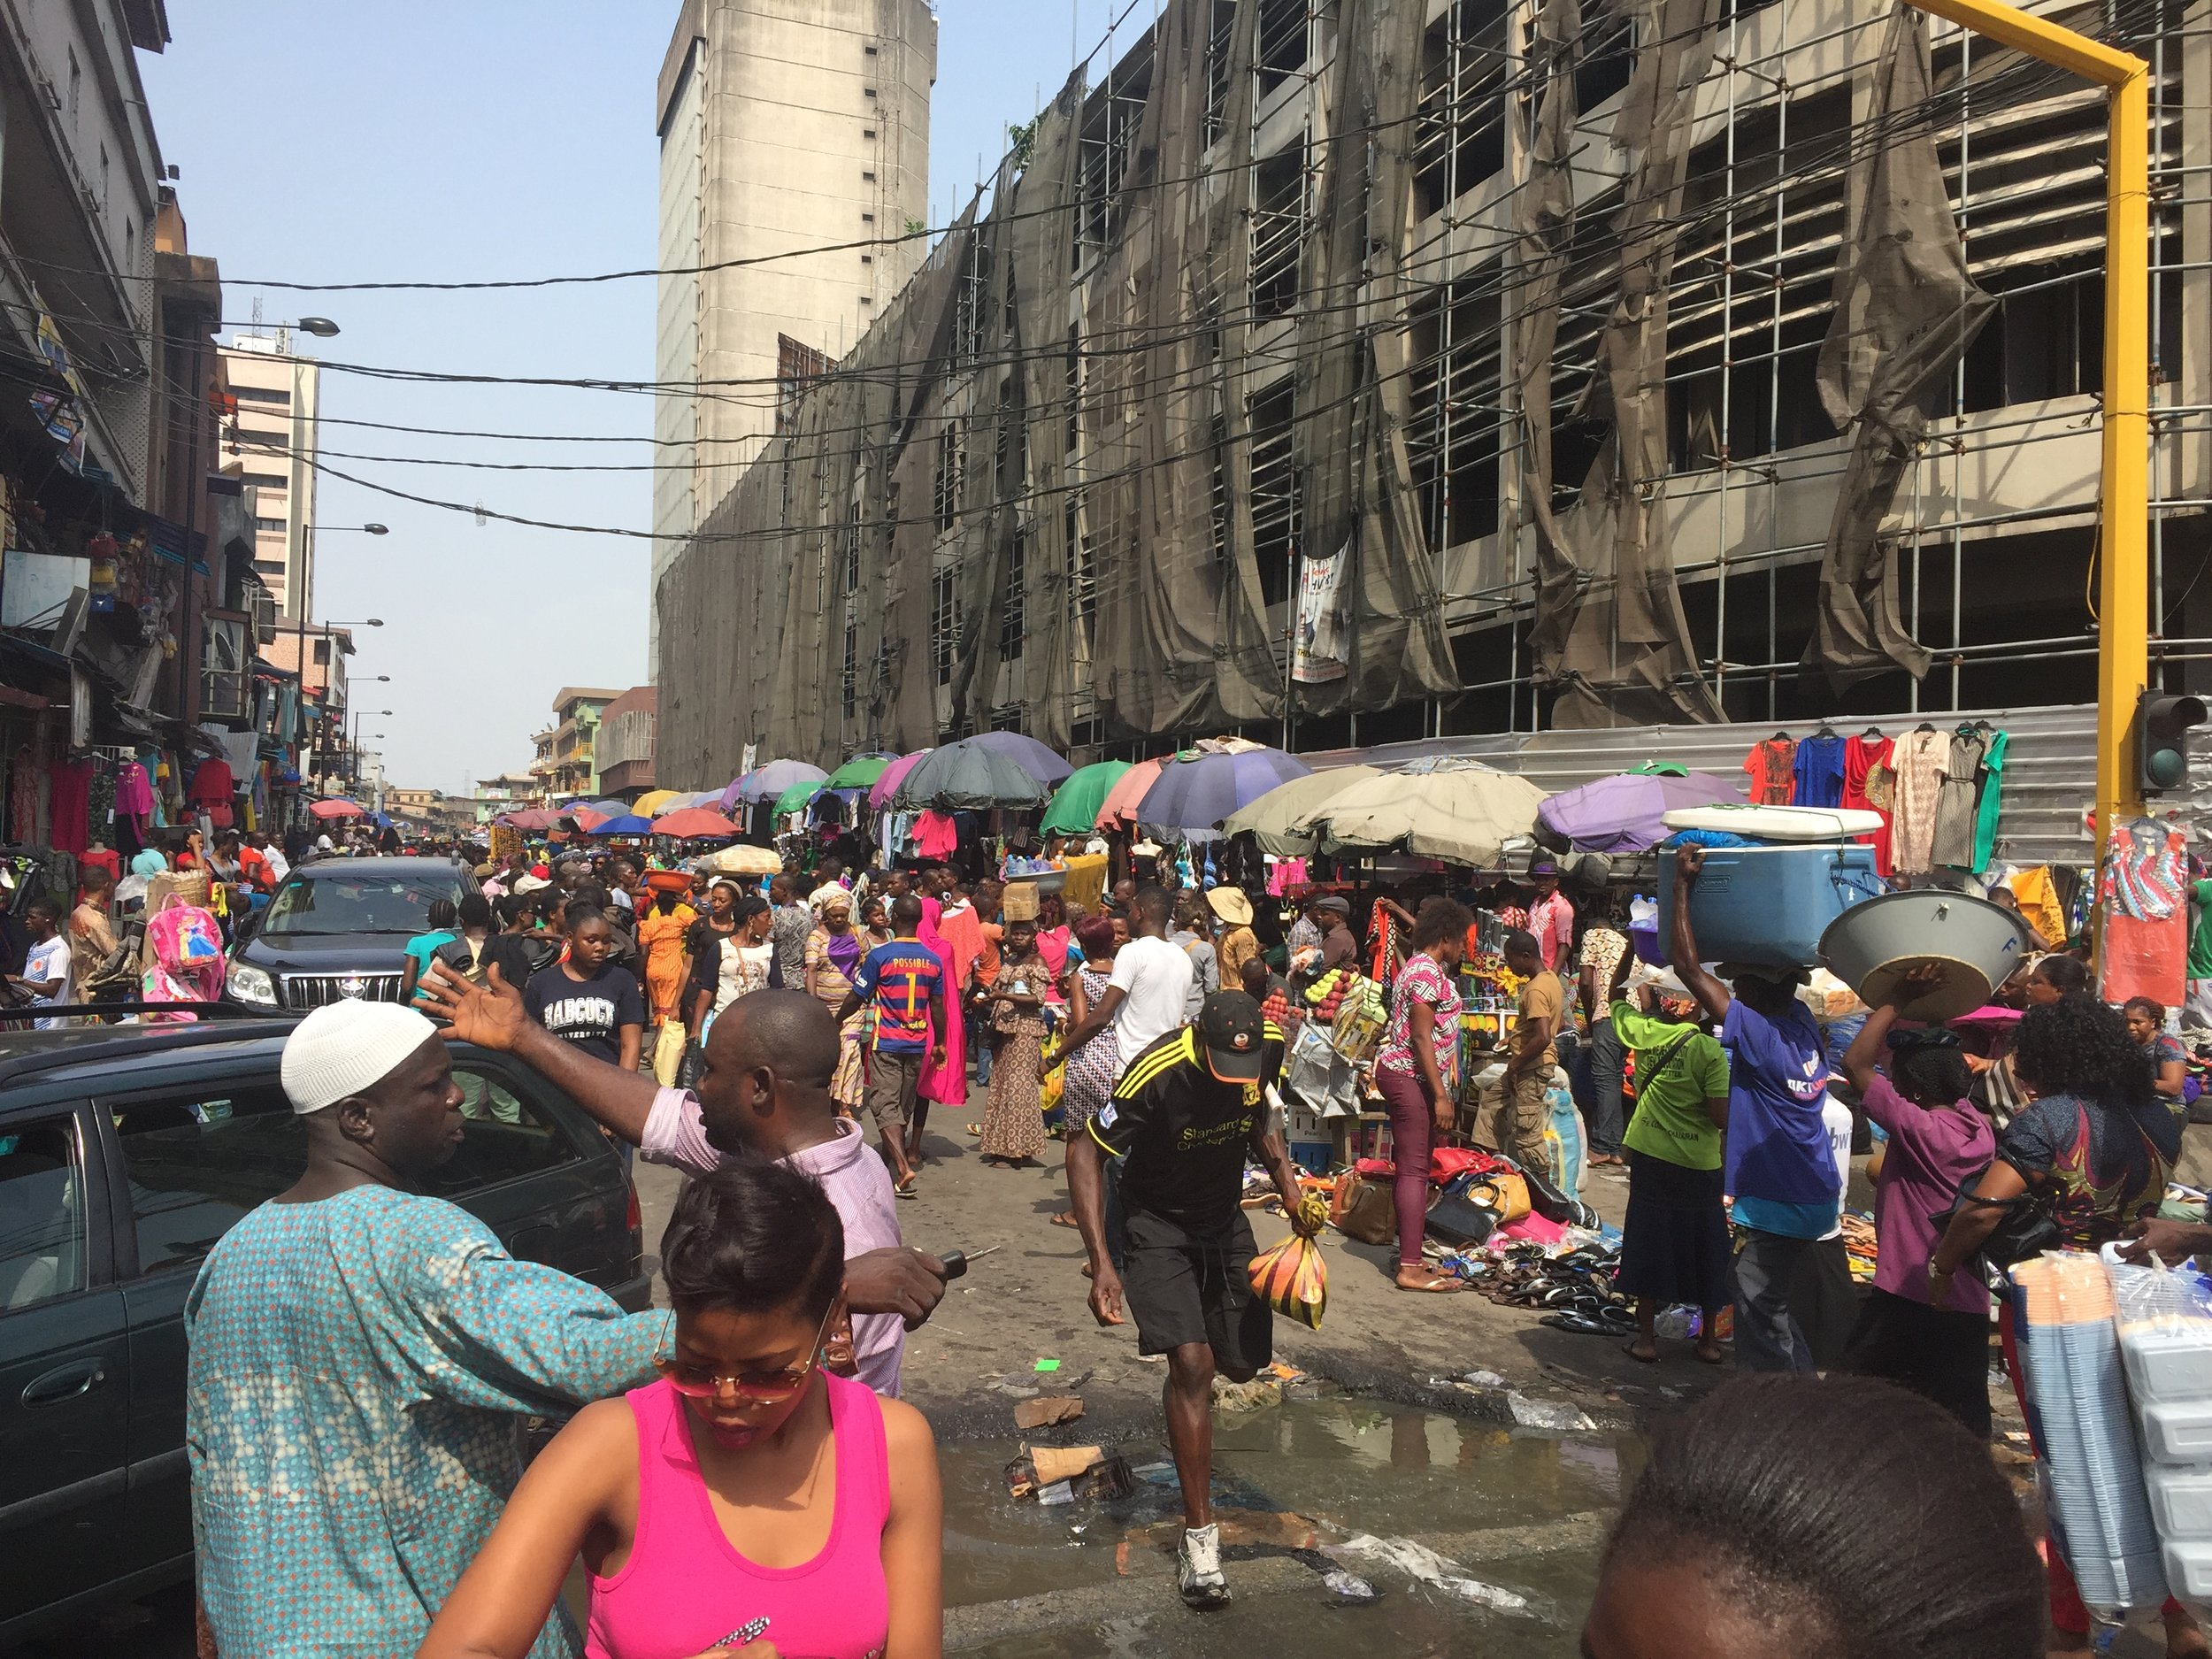 Balogun Market / Source: futureforeignpolicy.com